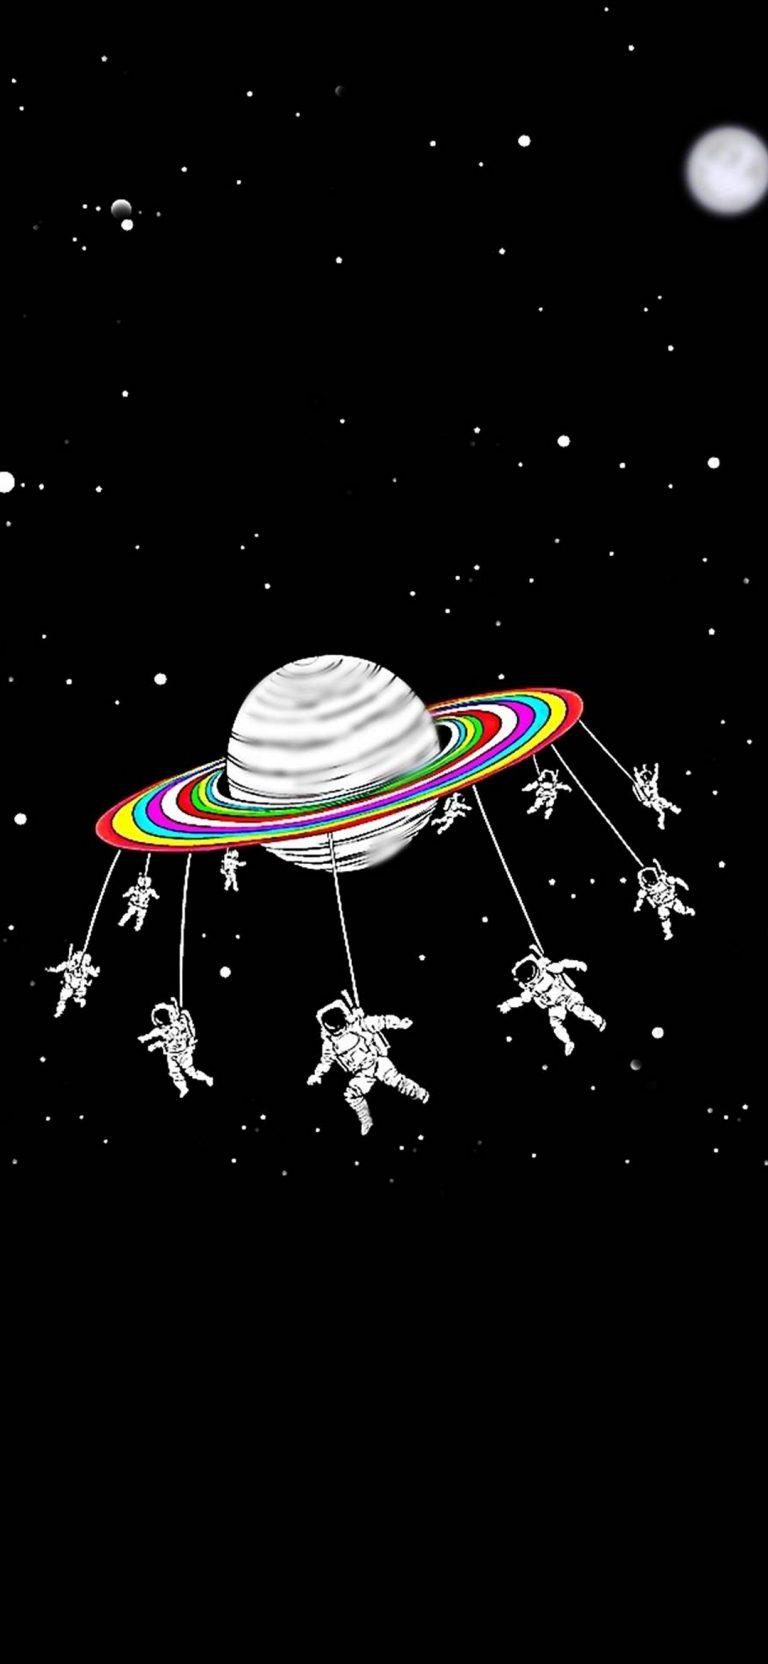 Space Phone Wallpaper 018 1080x2340 768x1664